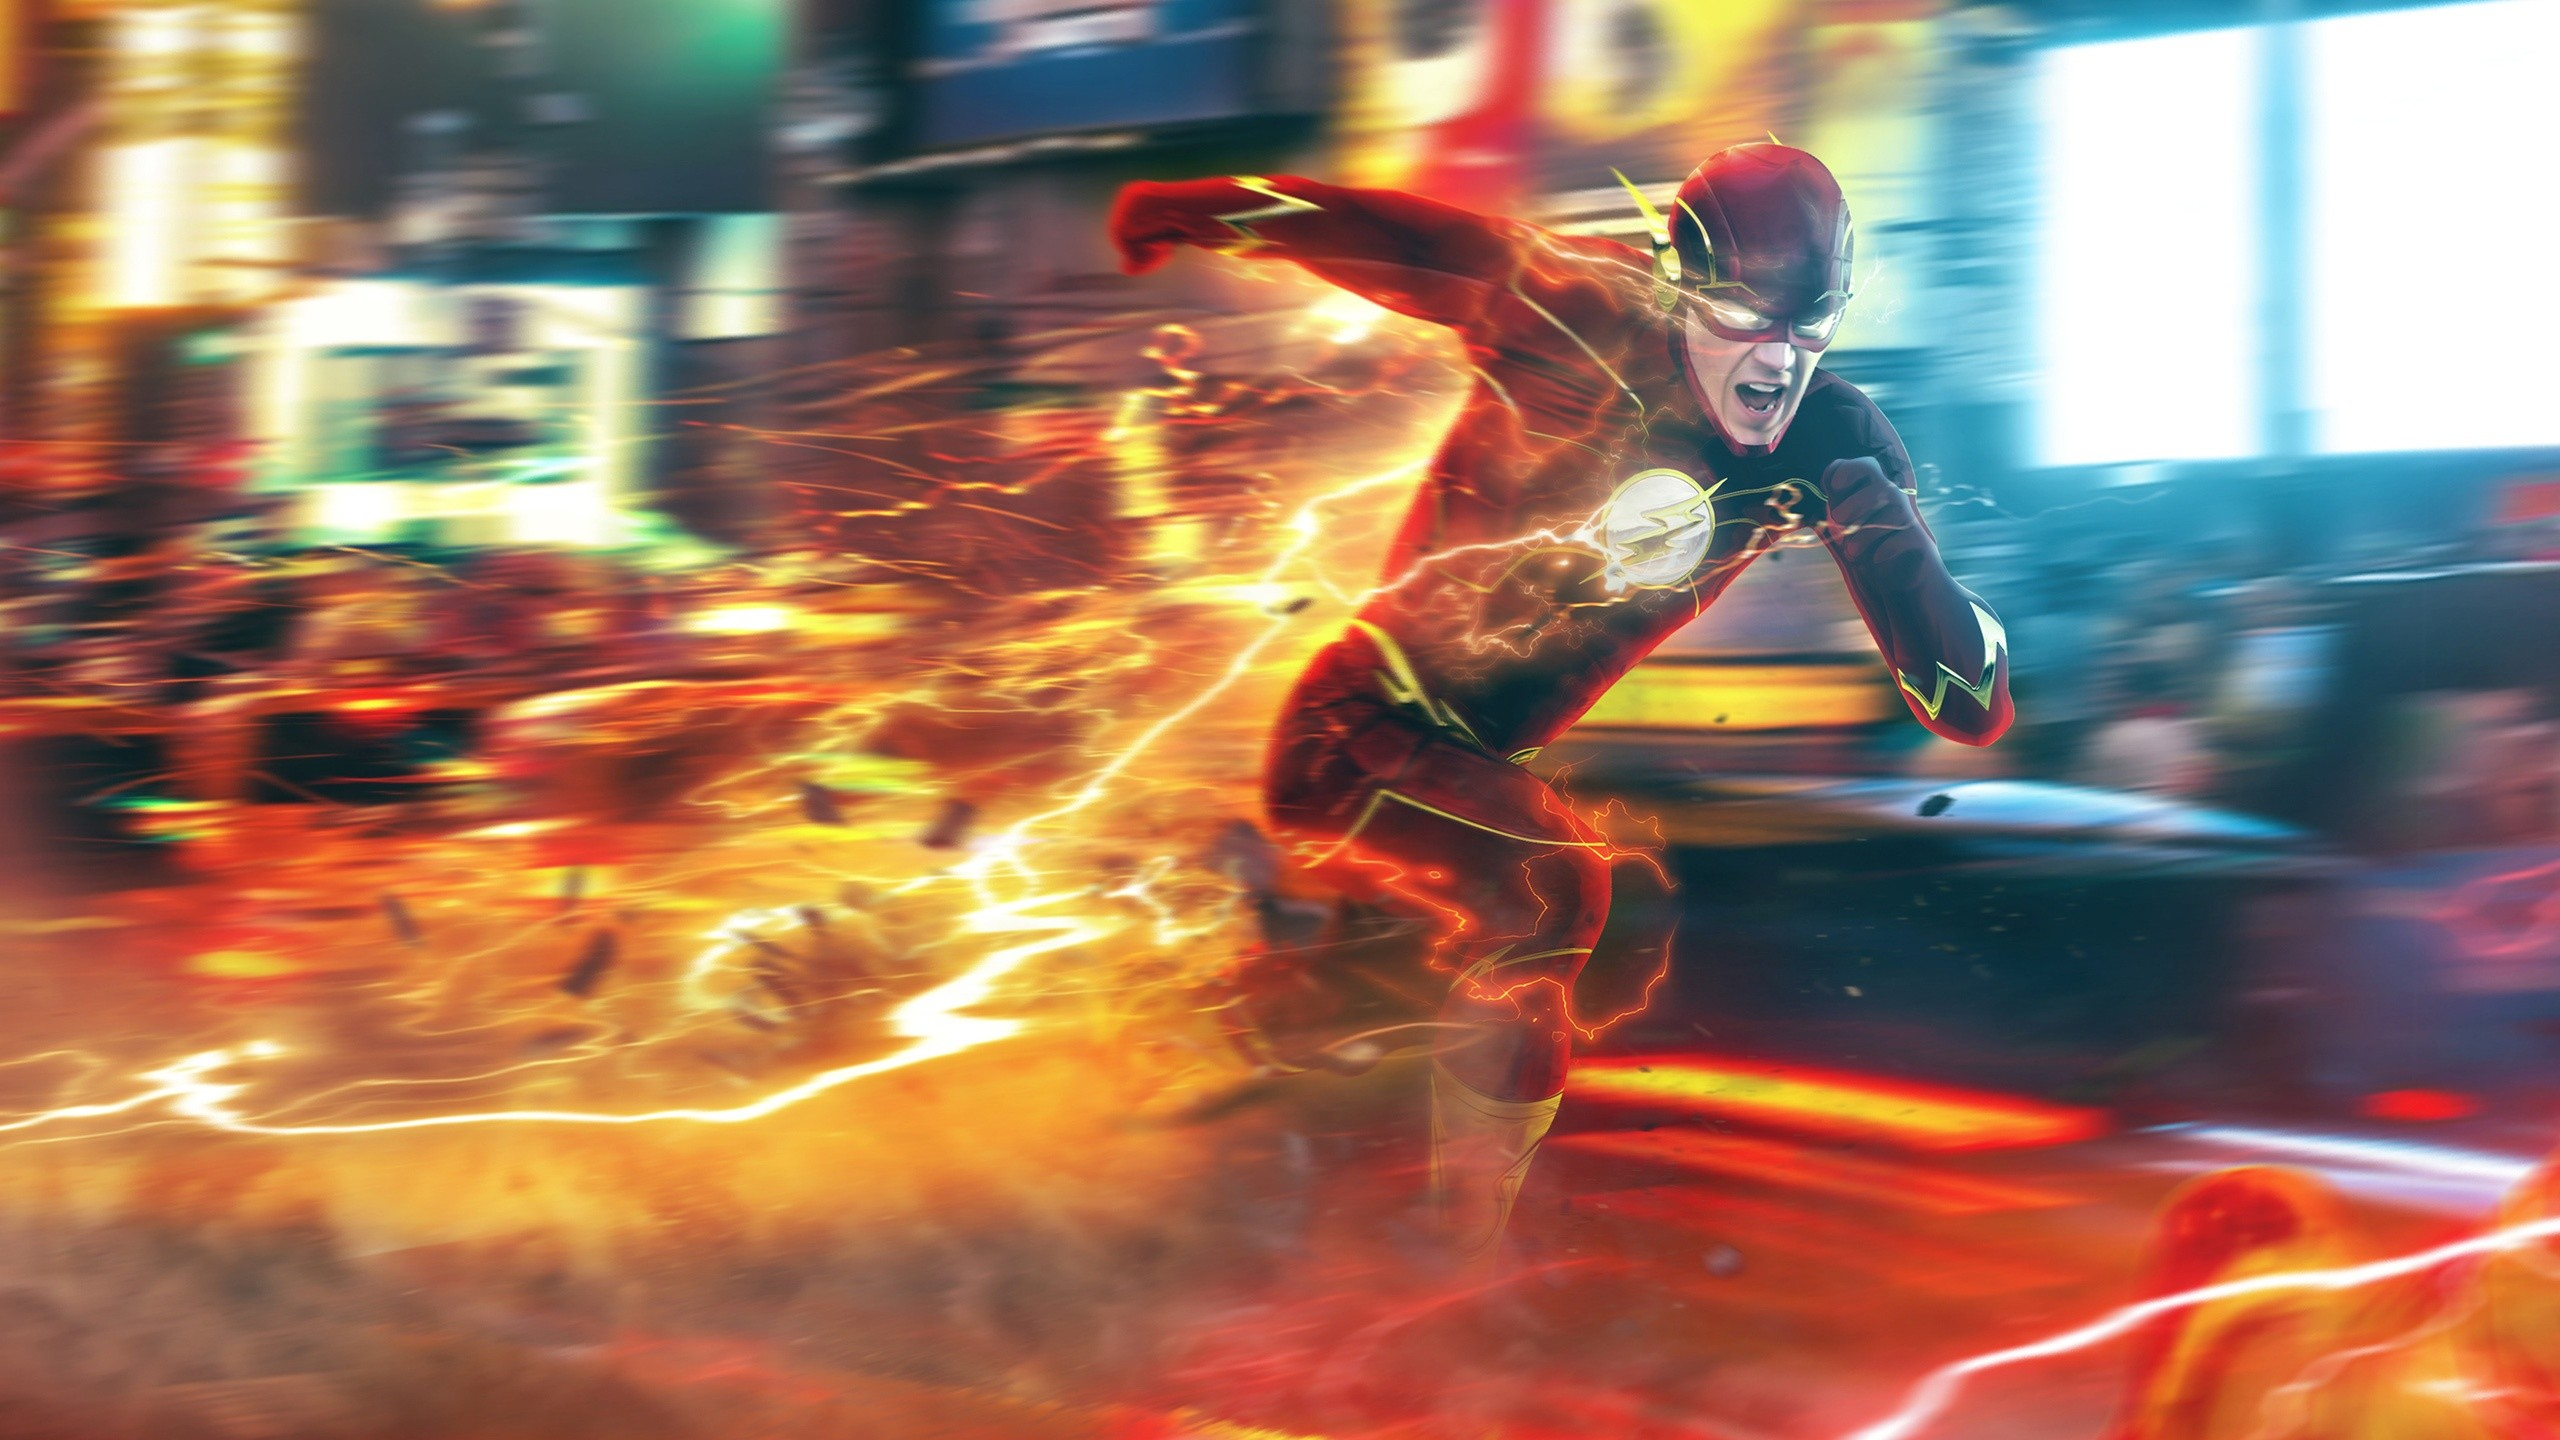 The Flash 4K Wallpaper | Awesome | Pinterest | Eddie thawne and Eobard  thawne